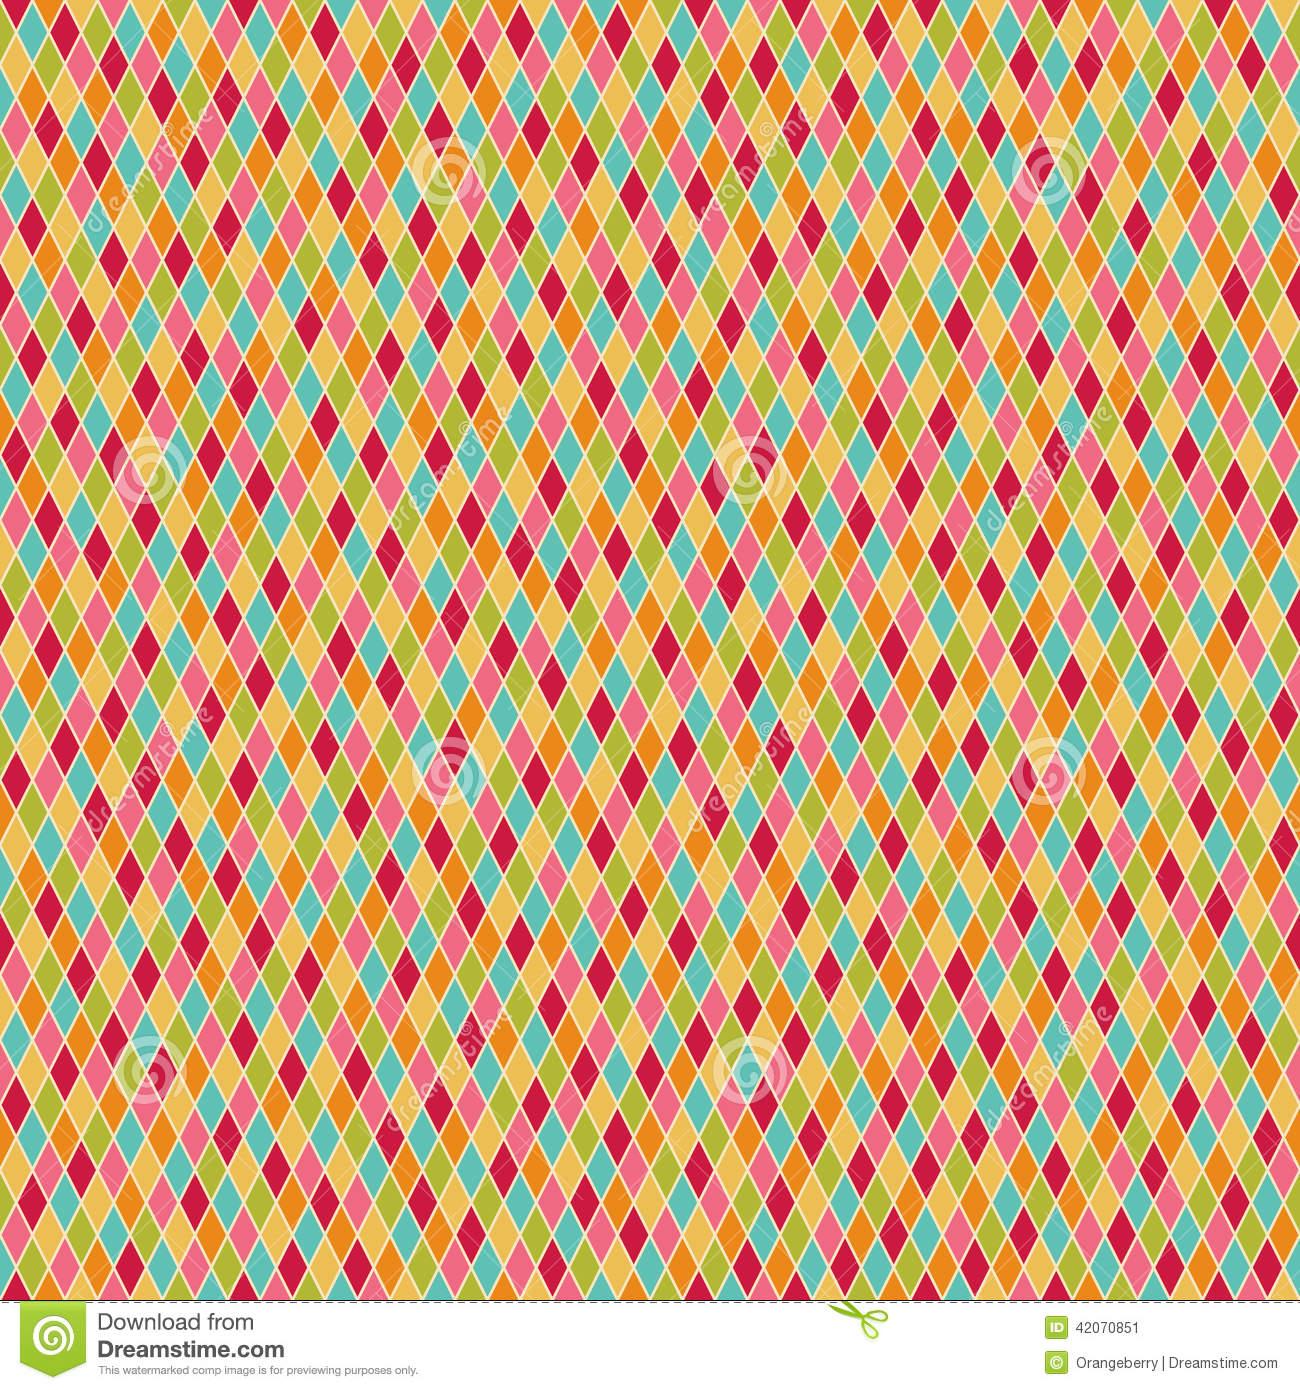 Diamond Harlequin Pattern Wallpaper Seamless colorful harlequin 1300x1390